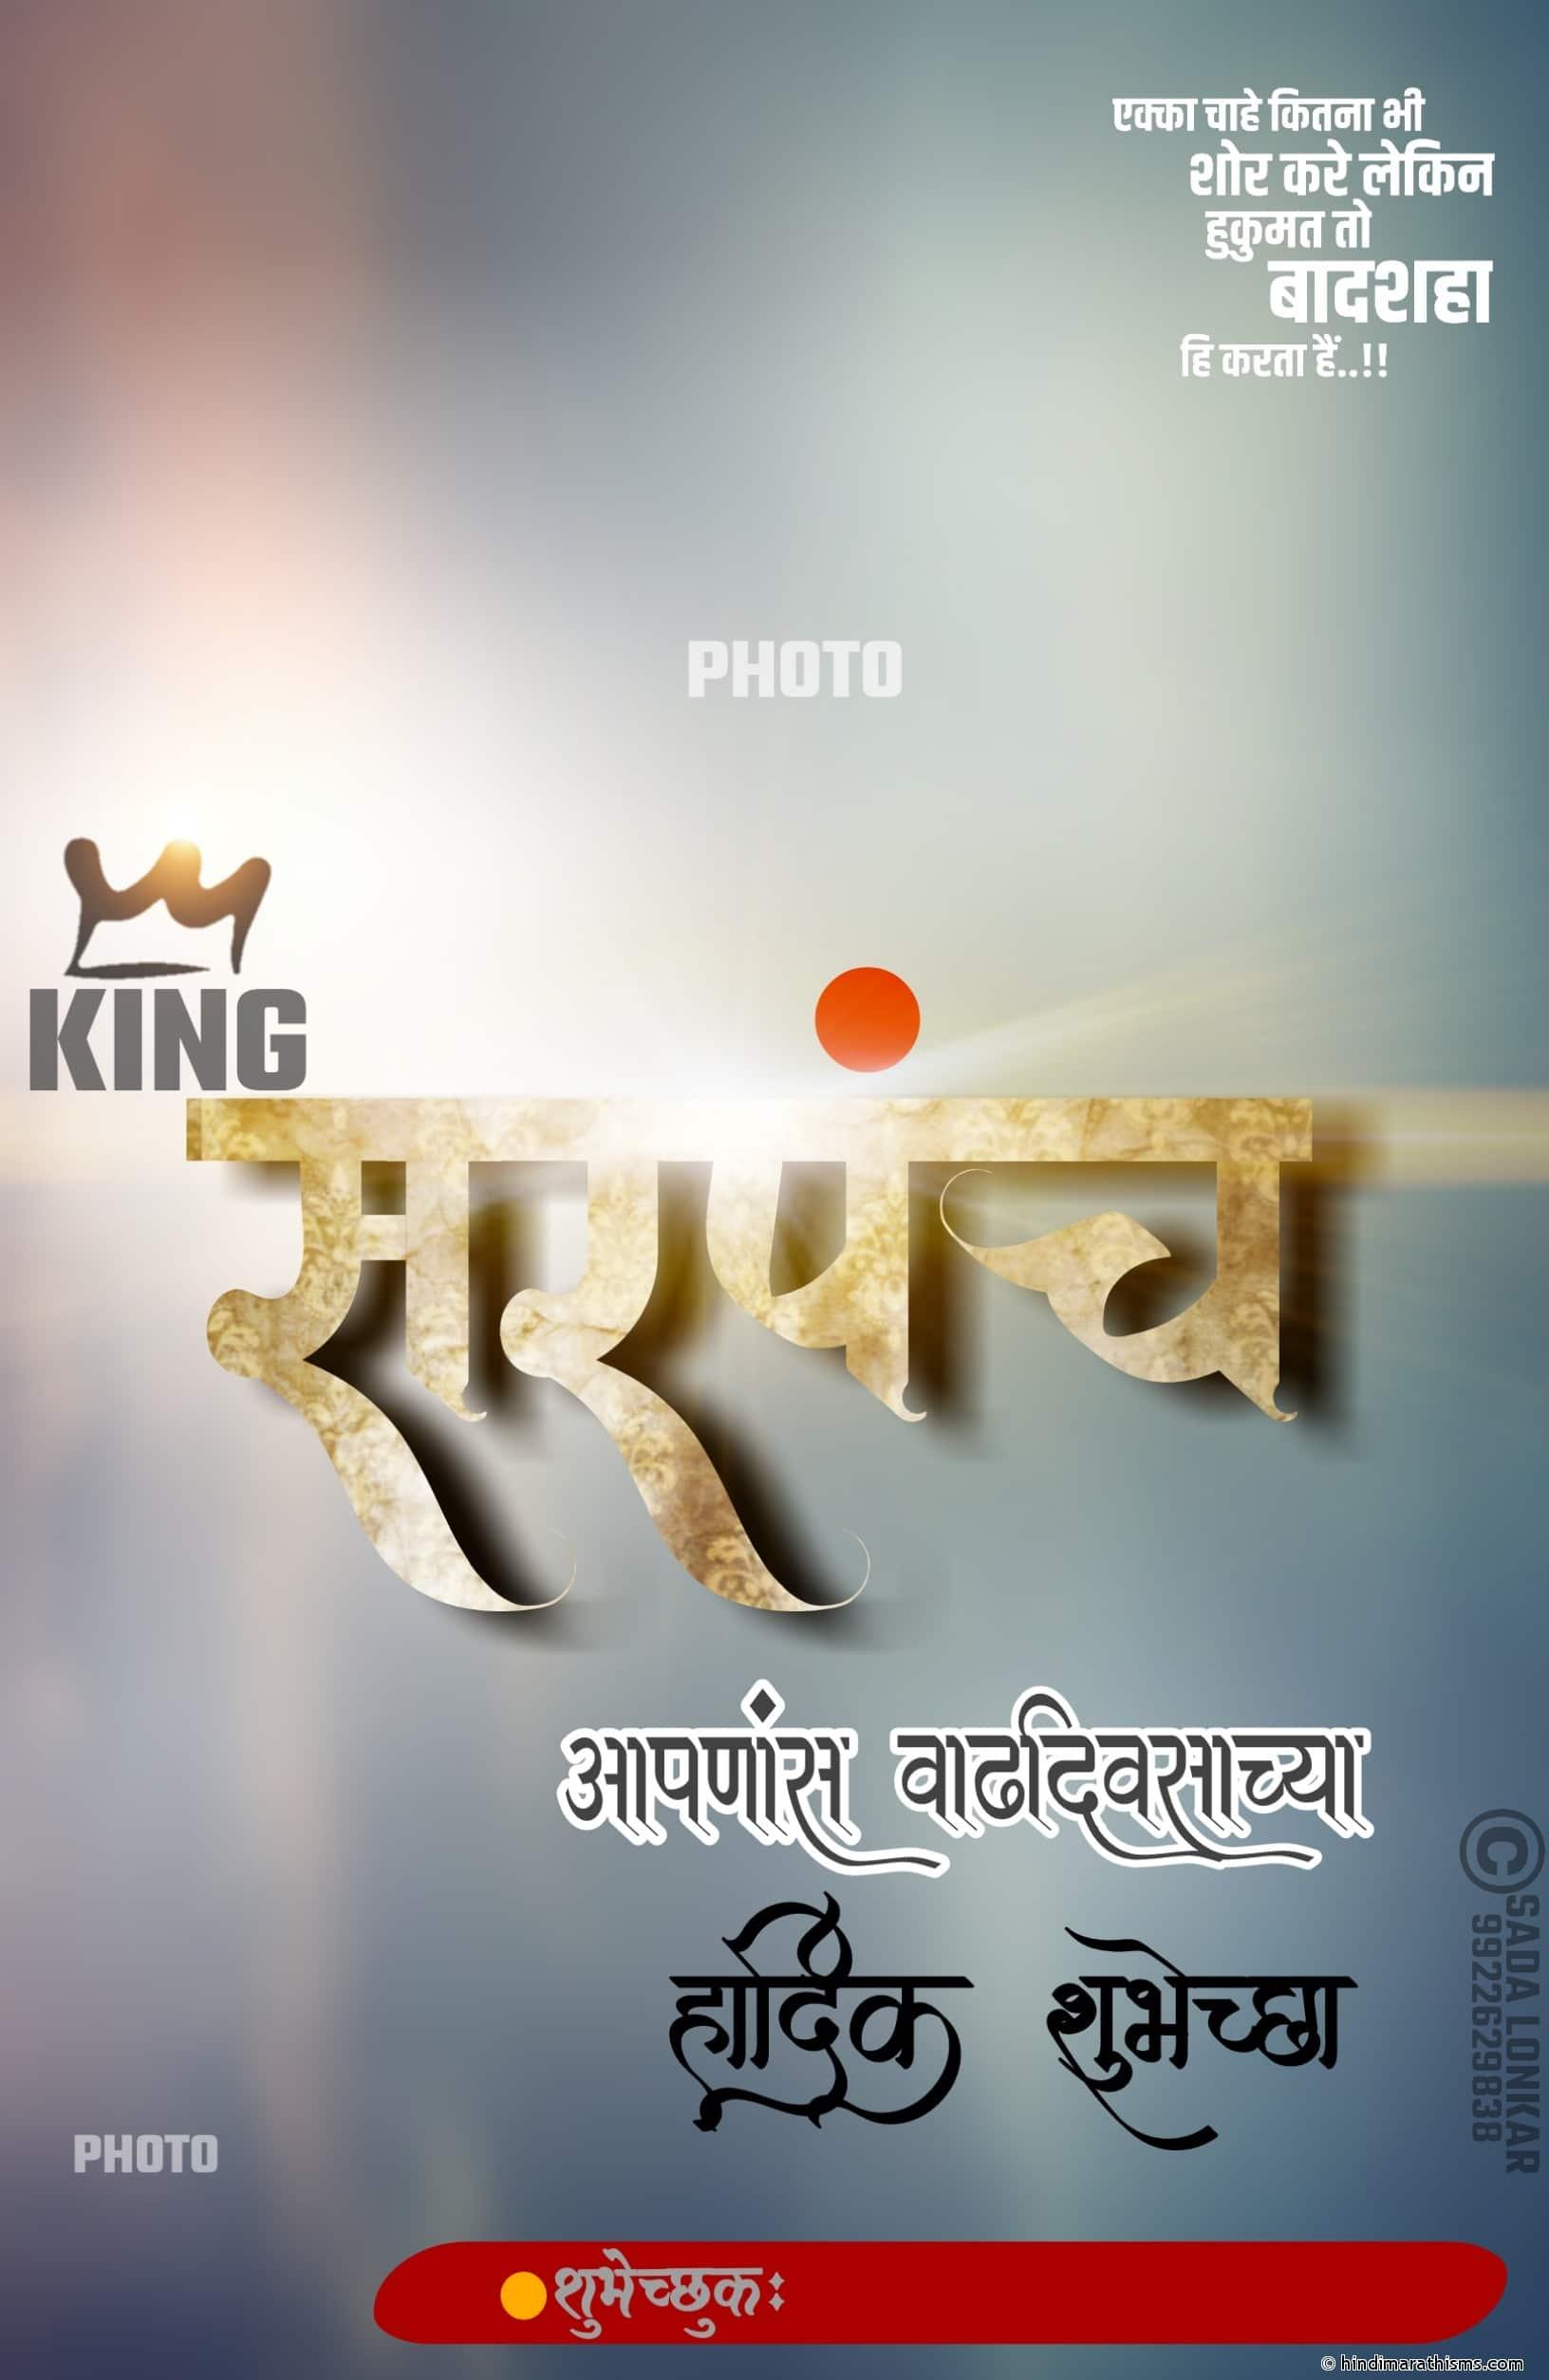 Sarpanch Vadhdivsachya Shubhechha Banner Image